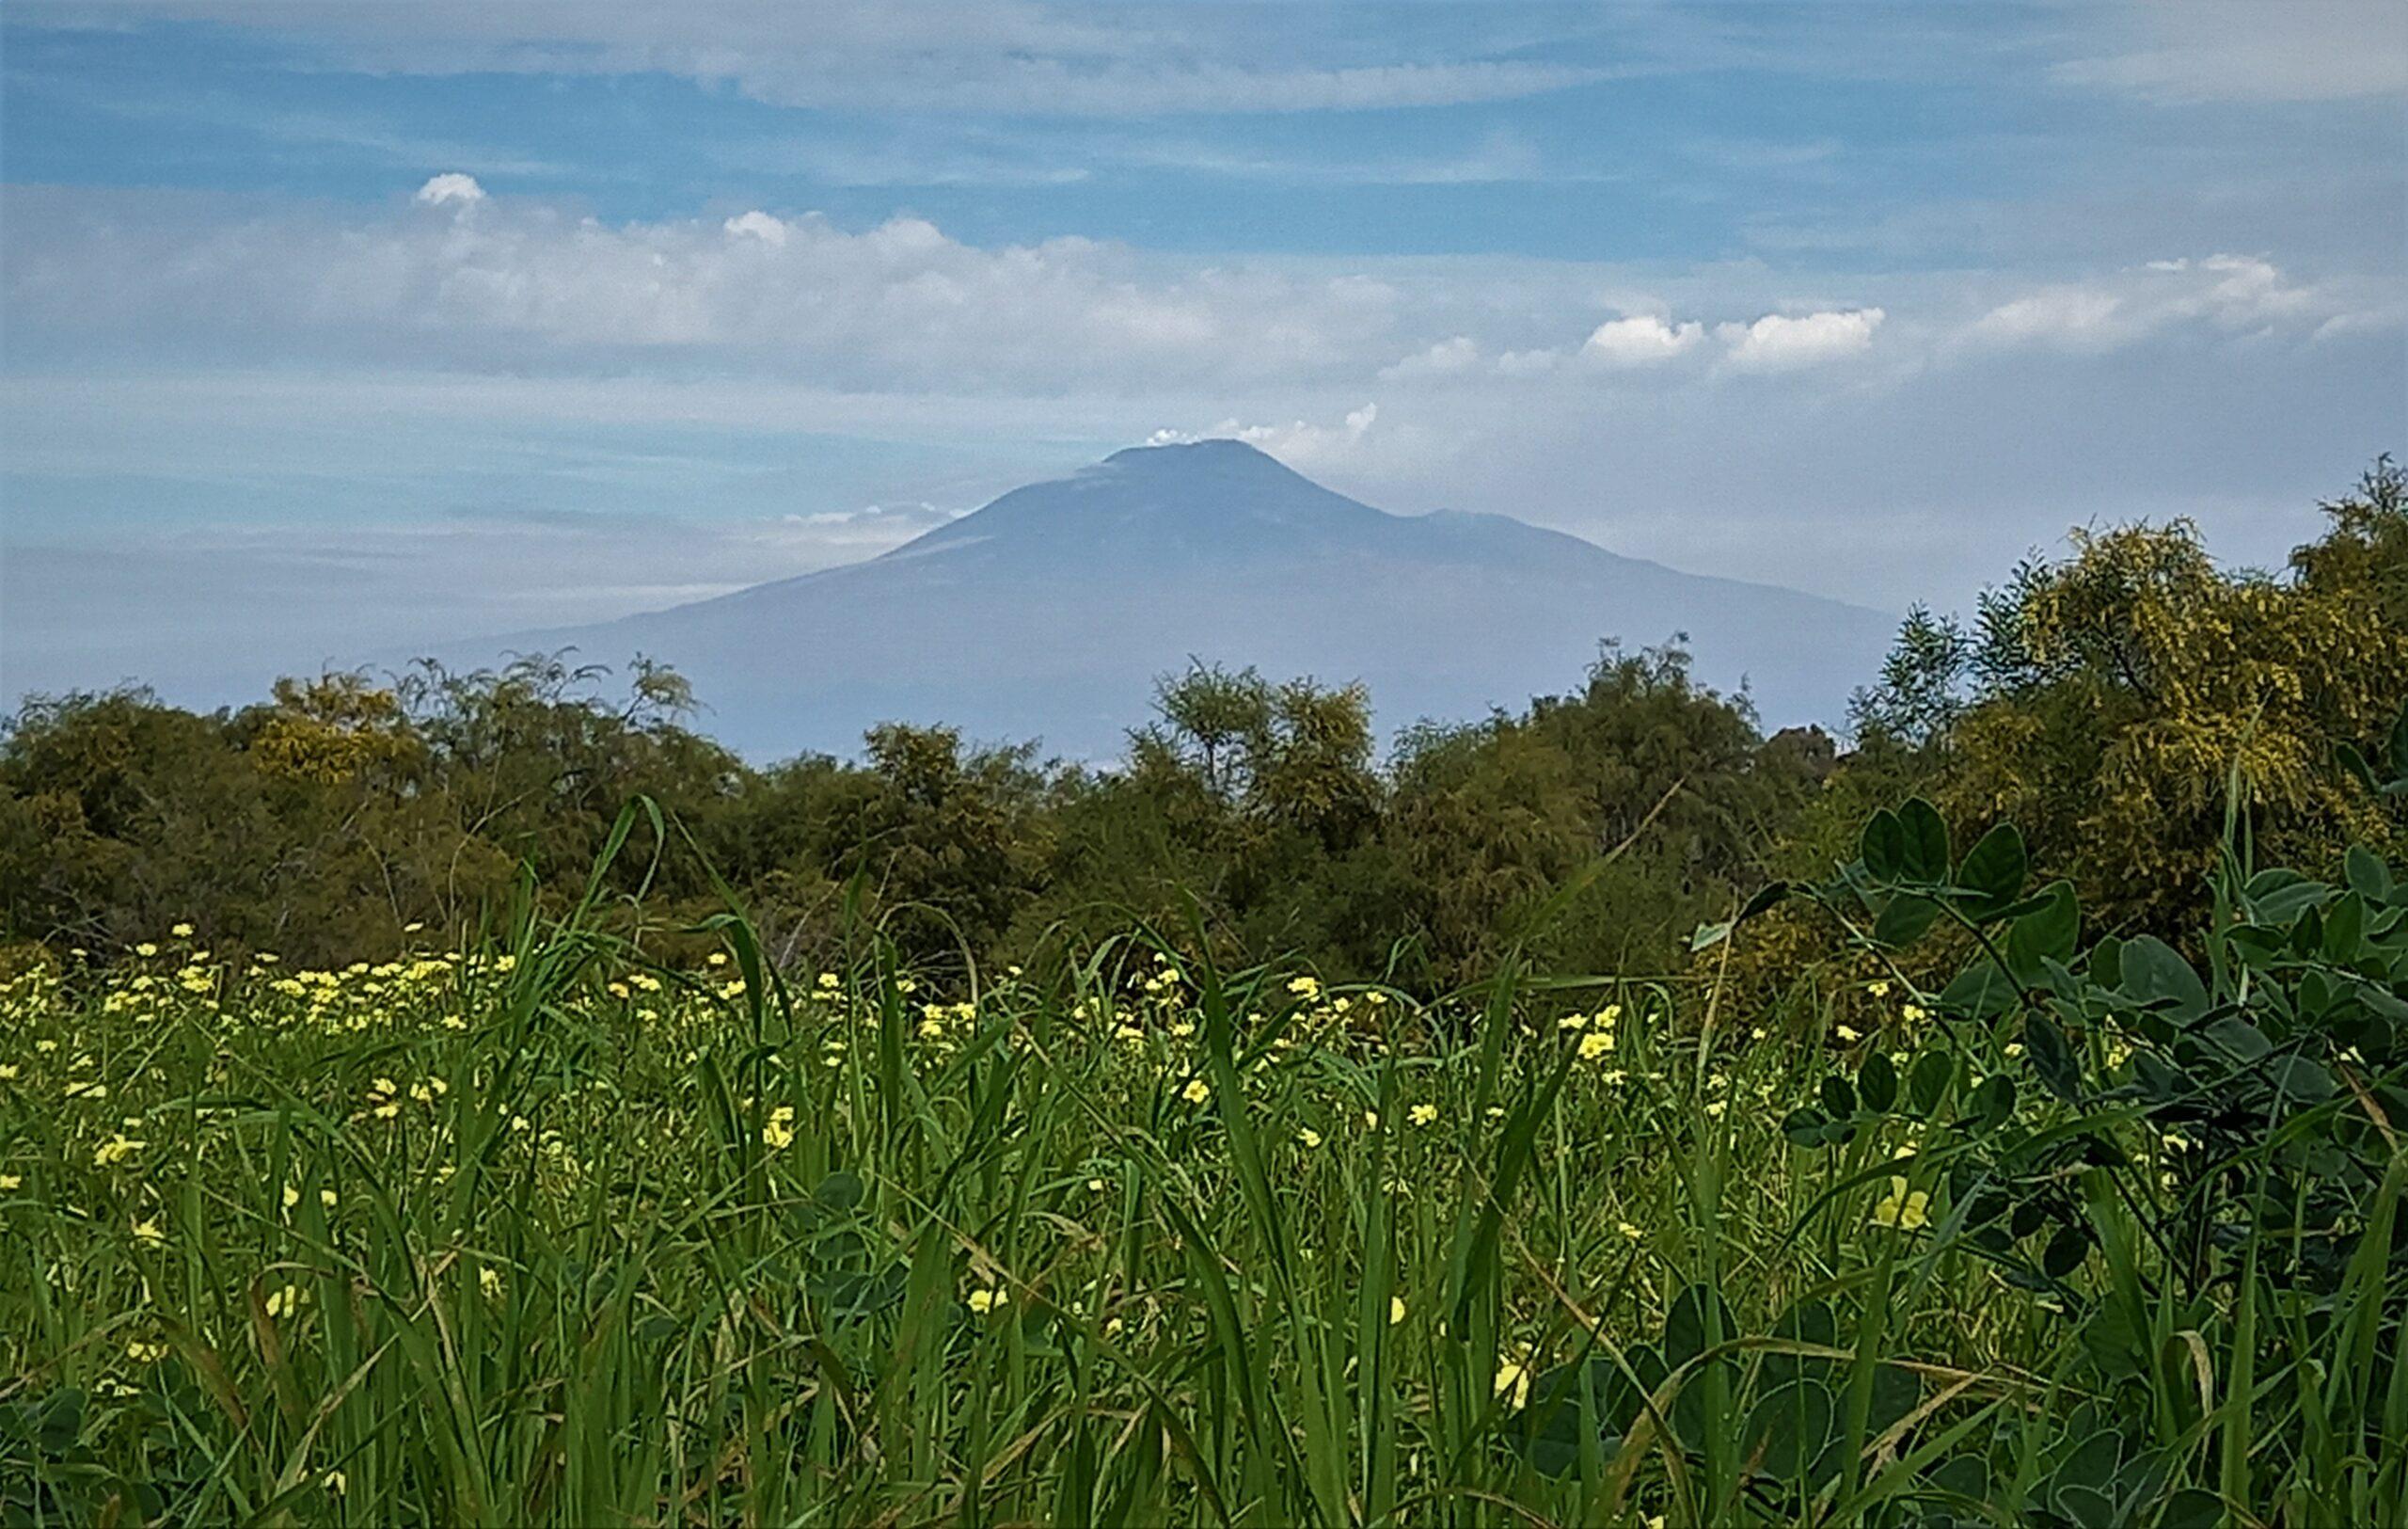 etna oasi del simeto sicily needs love